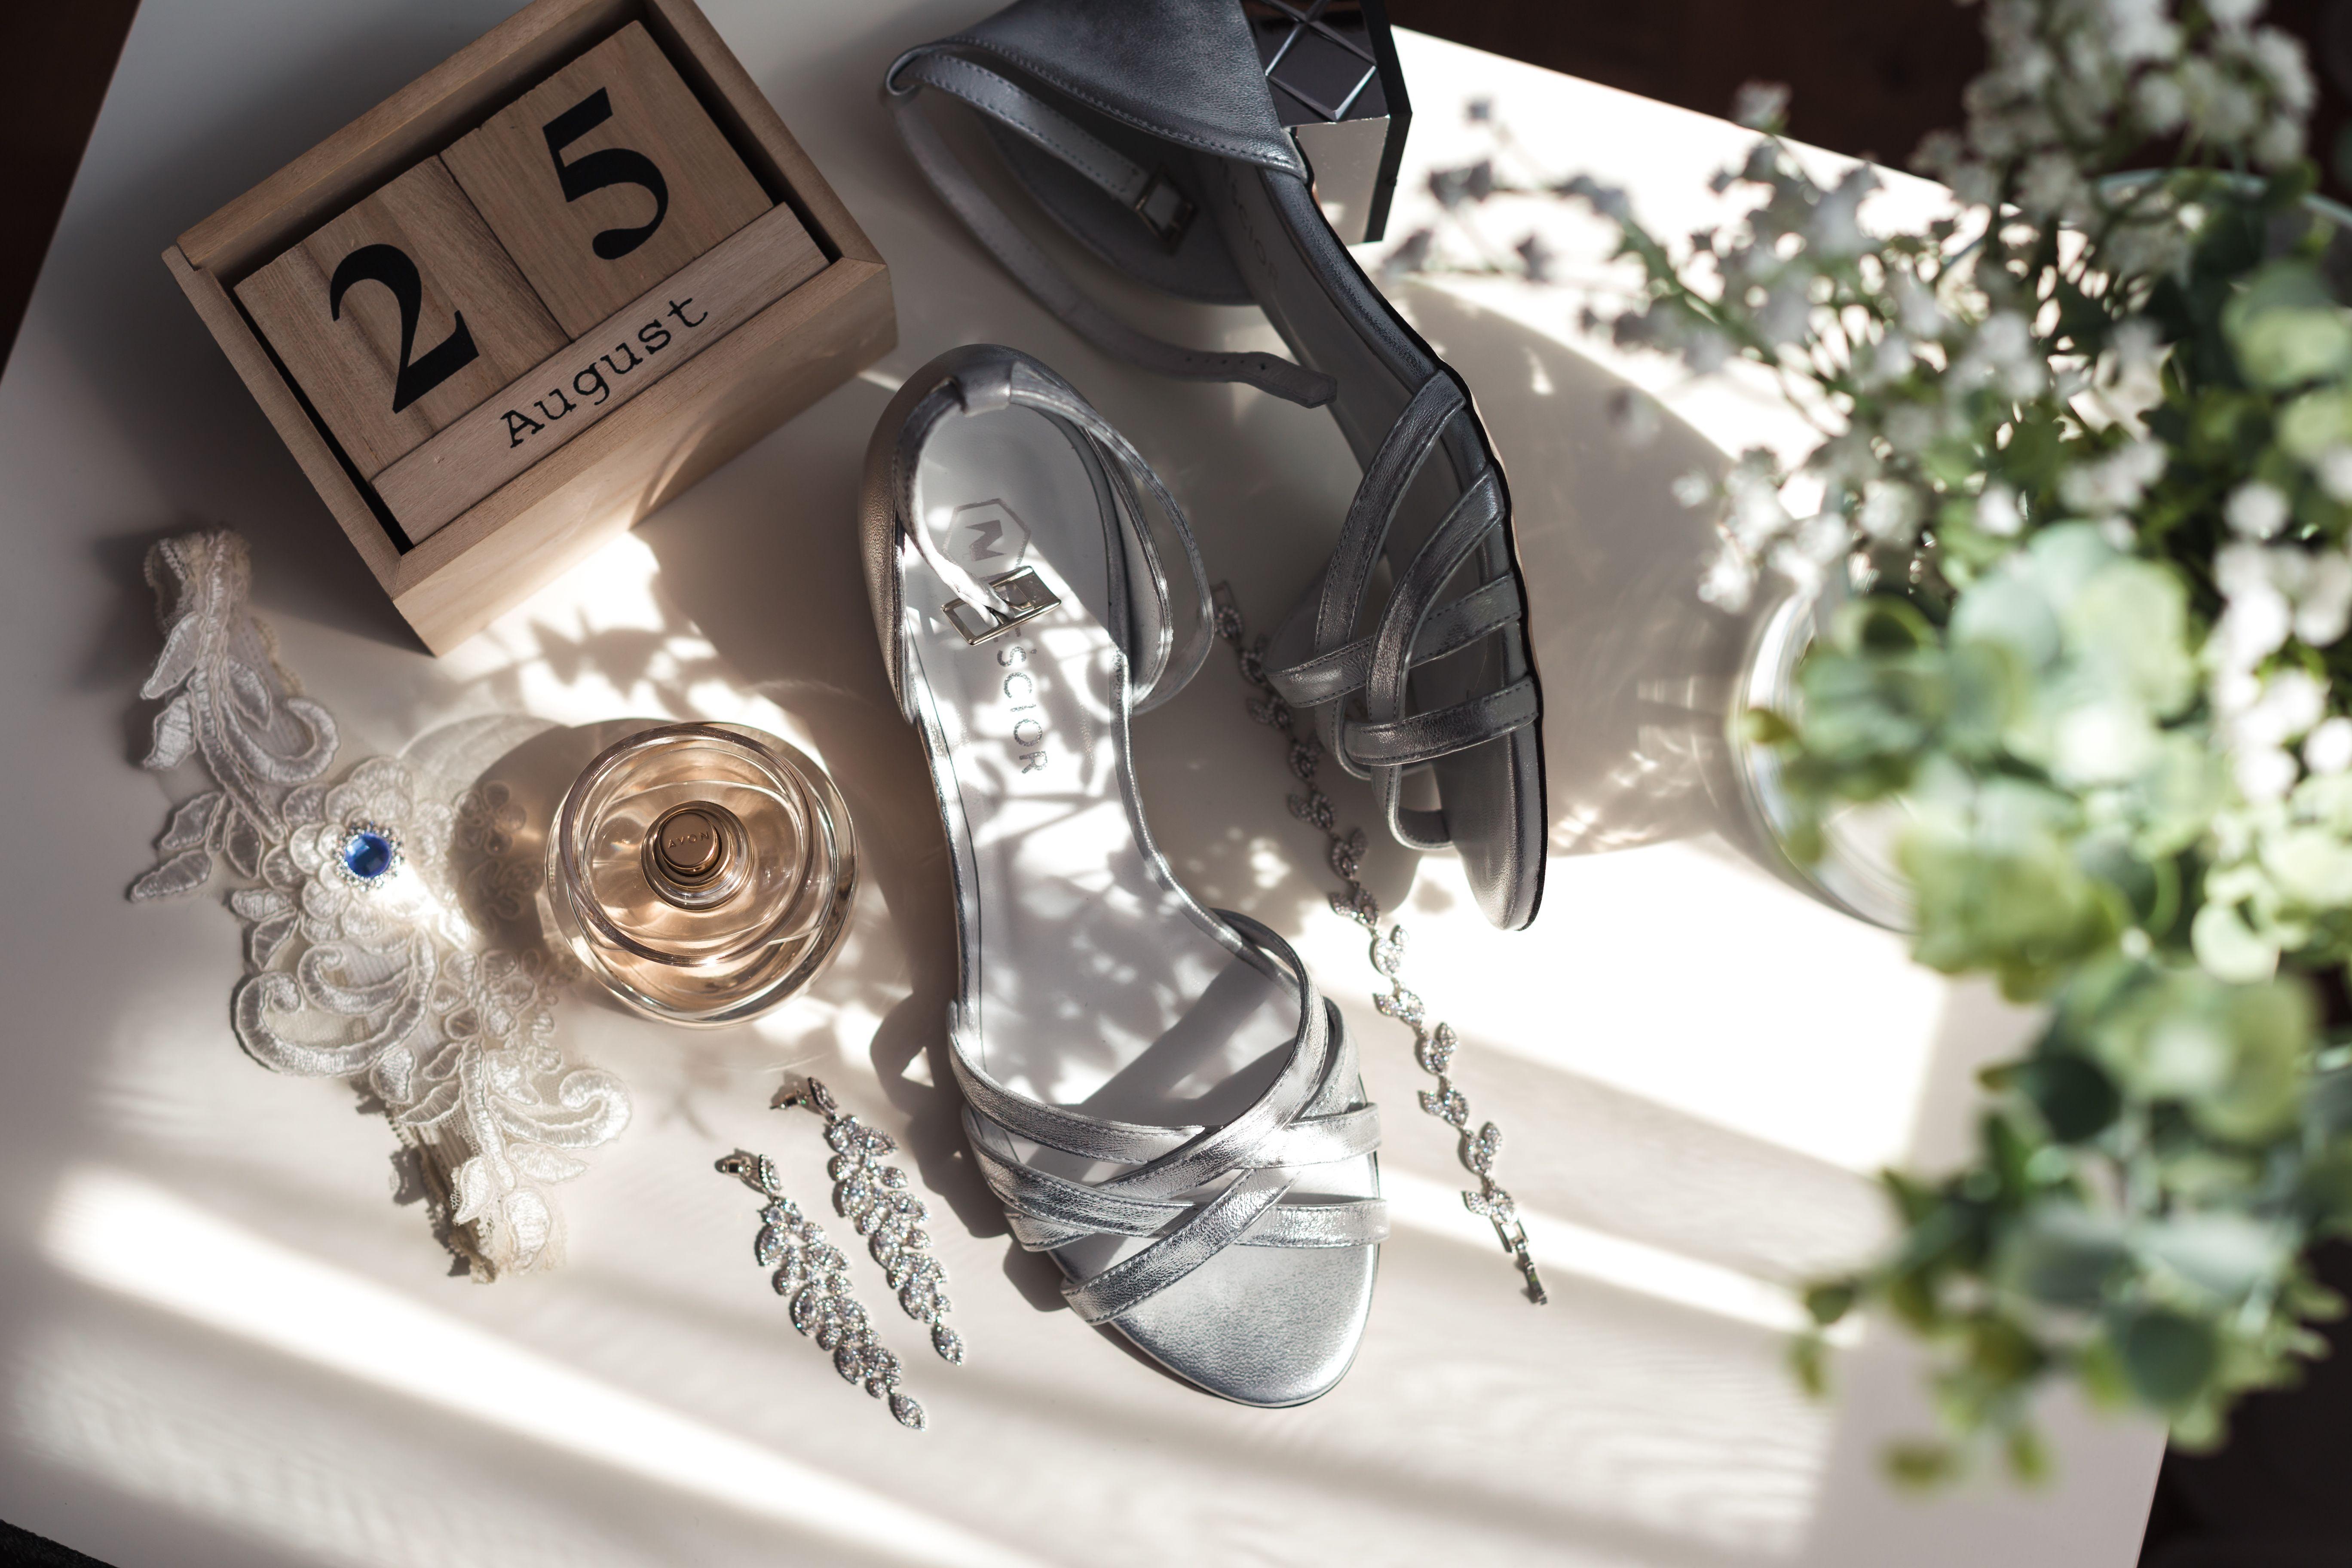 Detale Pani Mlodej Wedding Details White Dress Wedding